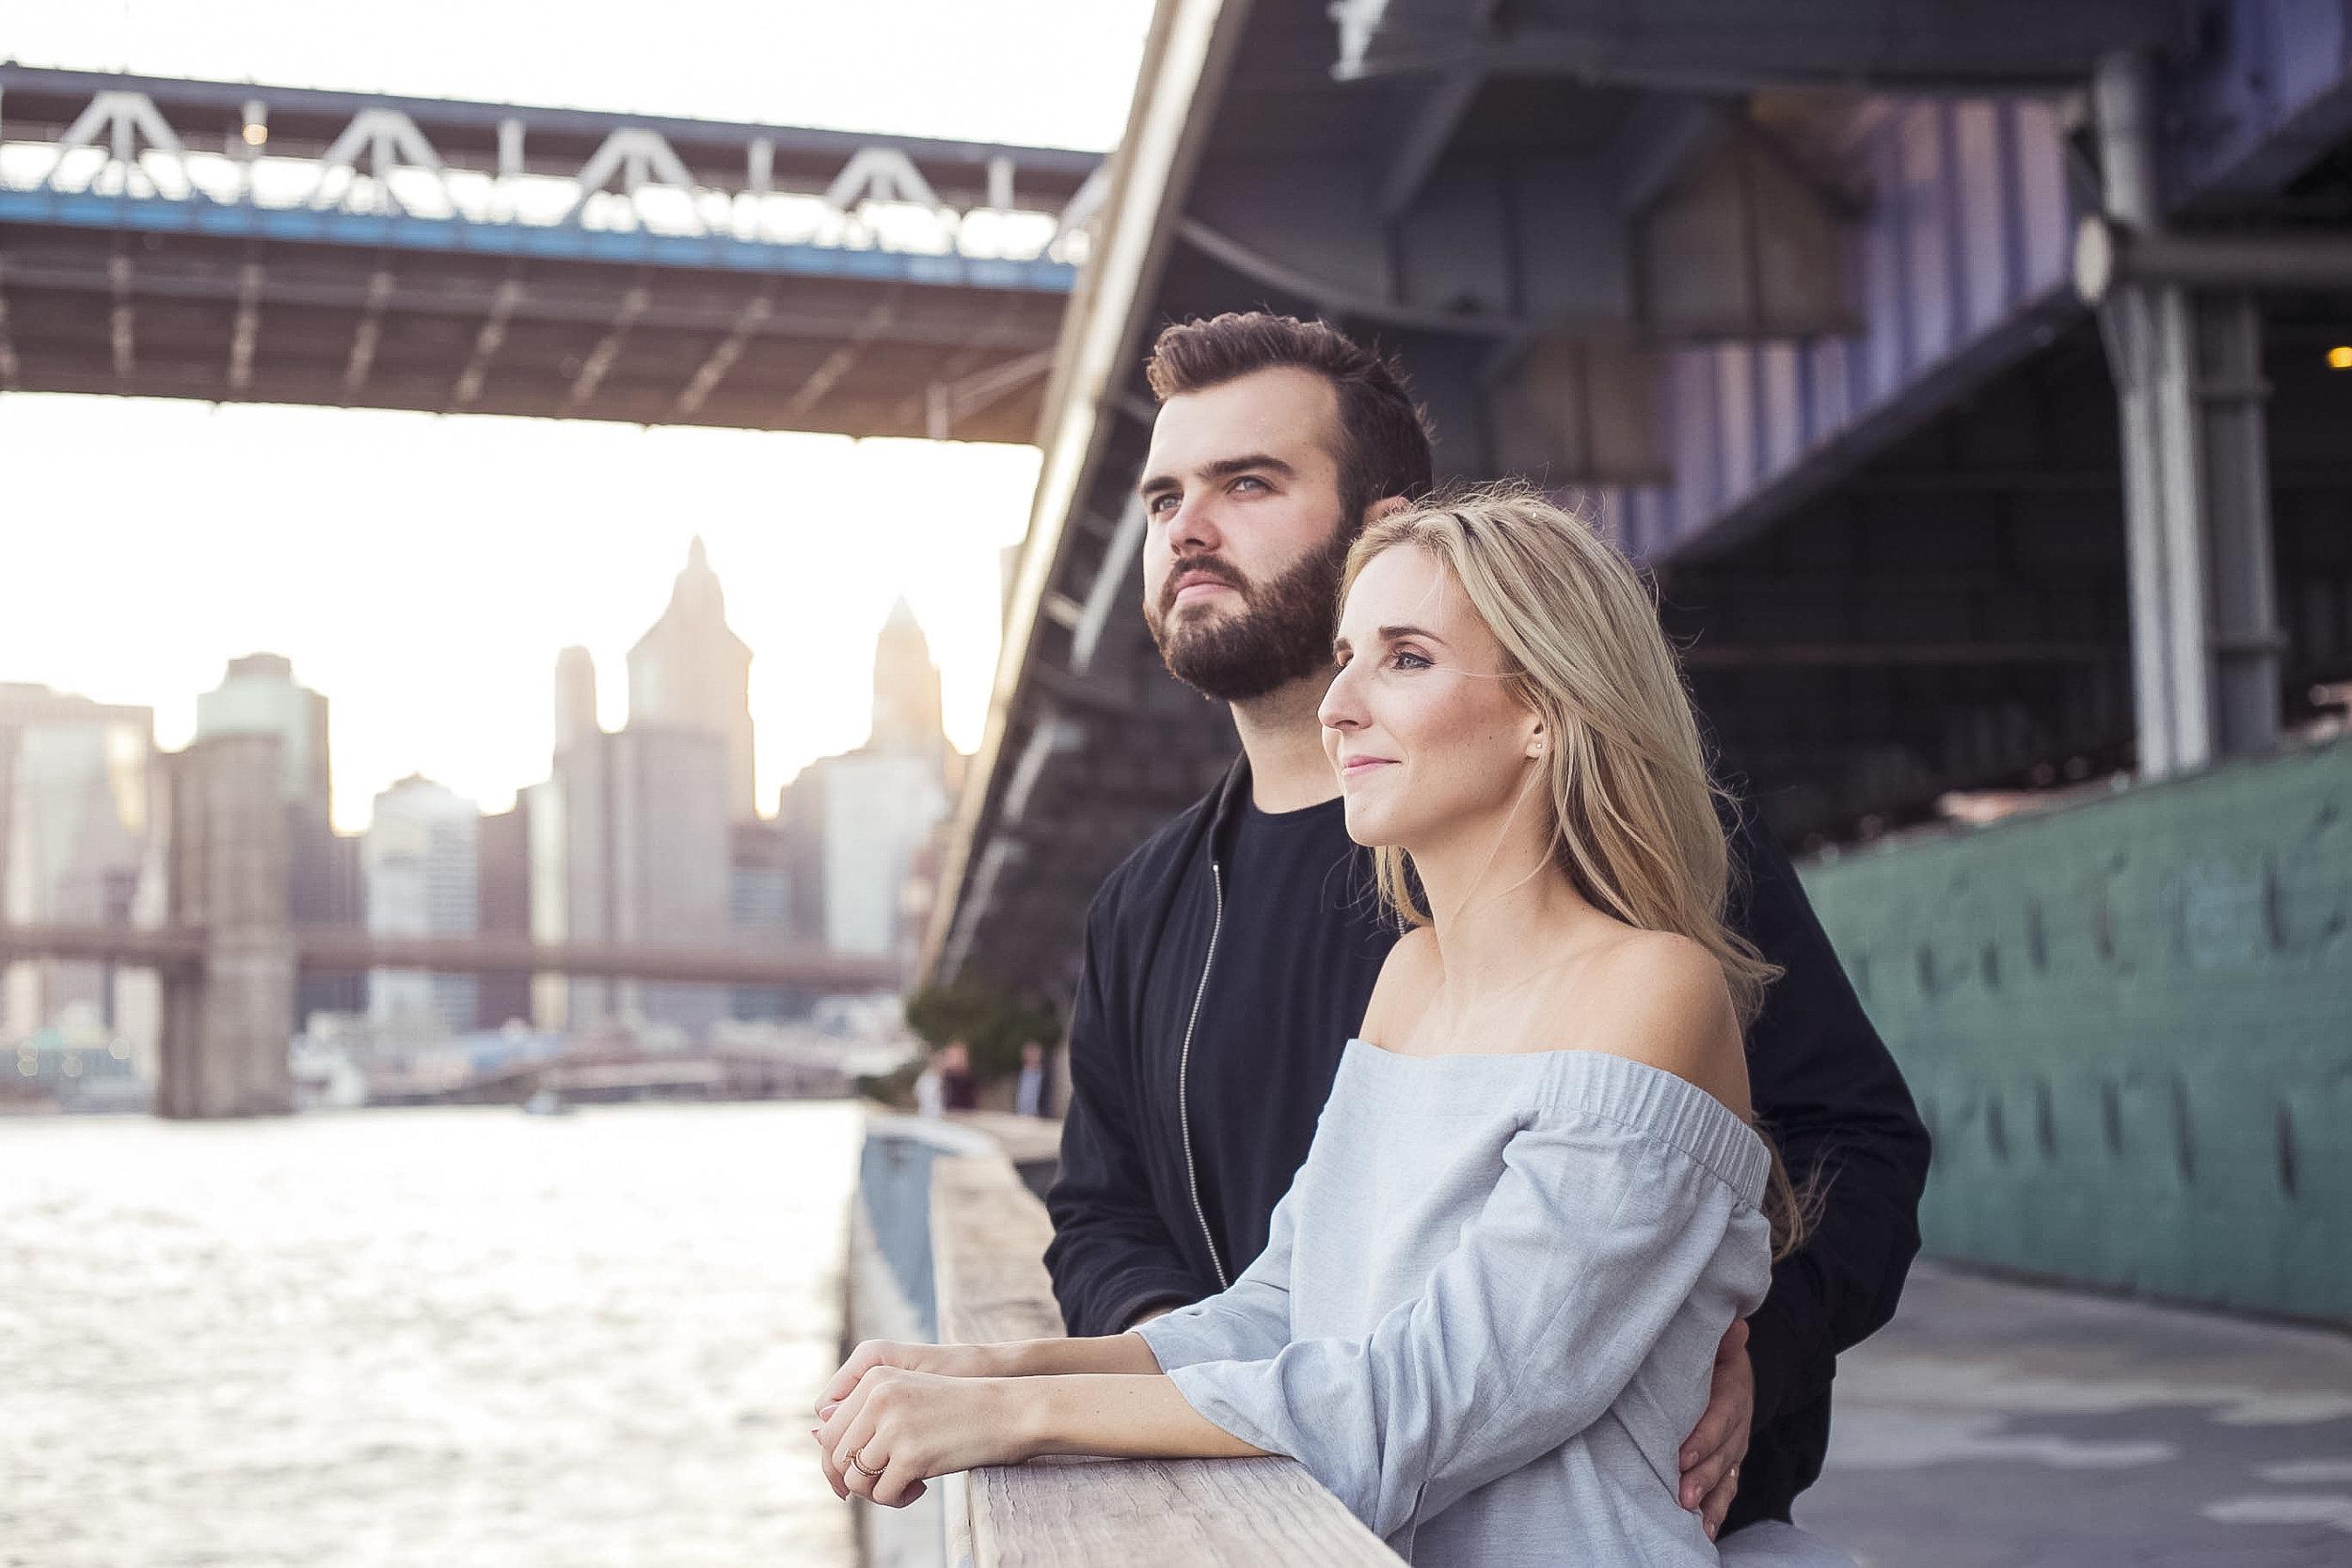 Dating en kristen pastor Online Dating andra datum tips